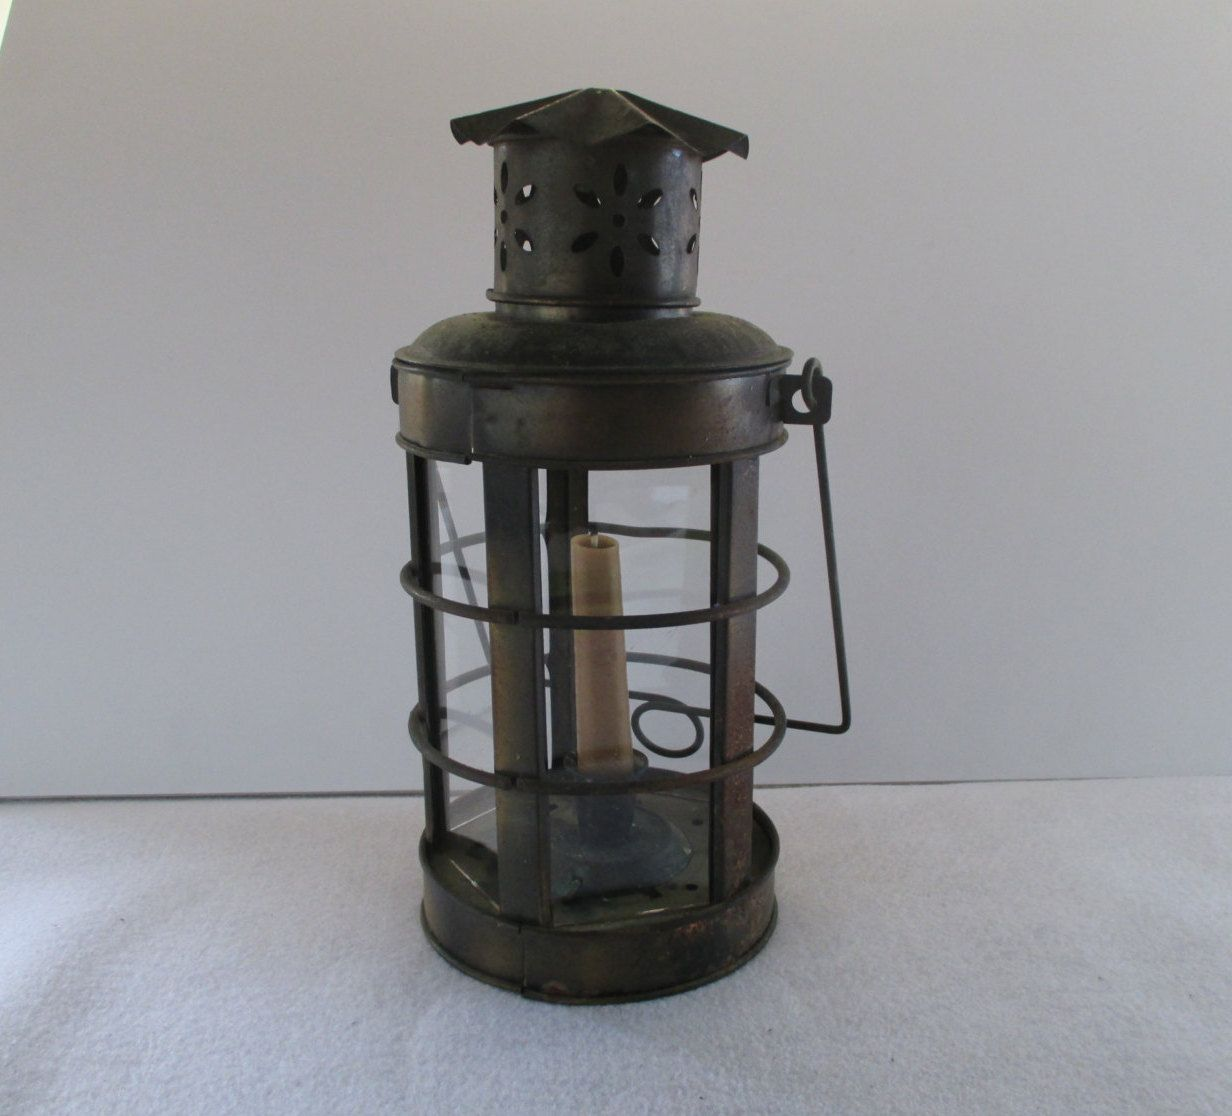 Candle Lantern, Metal Hanging Vintage, 5 Glass Sides, Porch Garden Party  Decor,